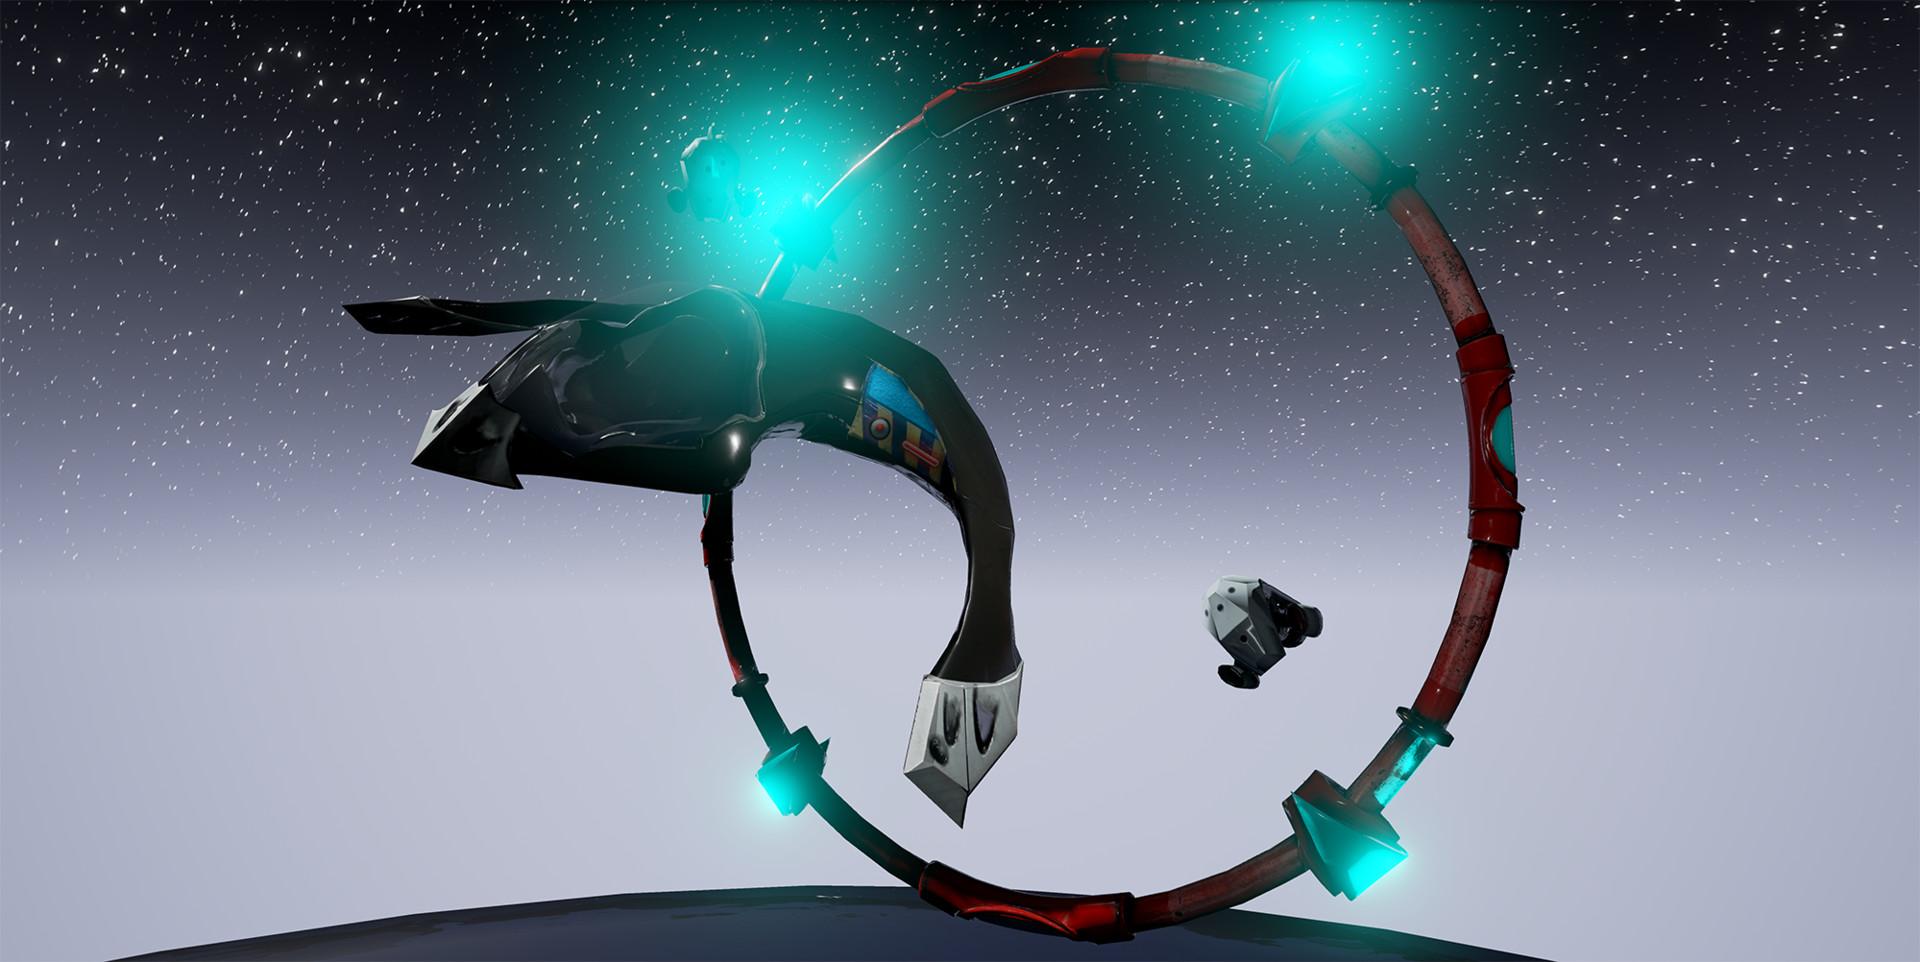 Omar qattan spaceshipscreenshot